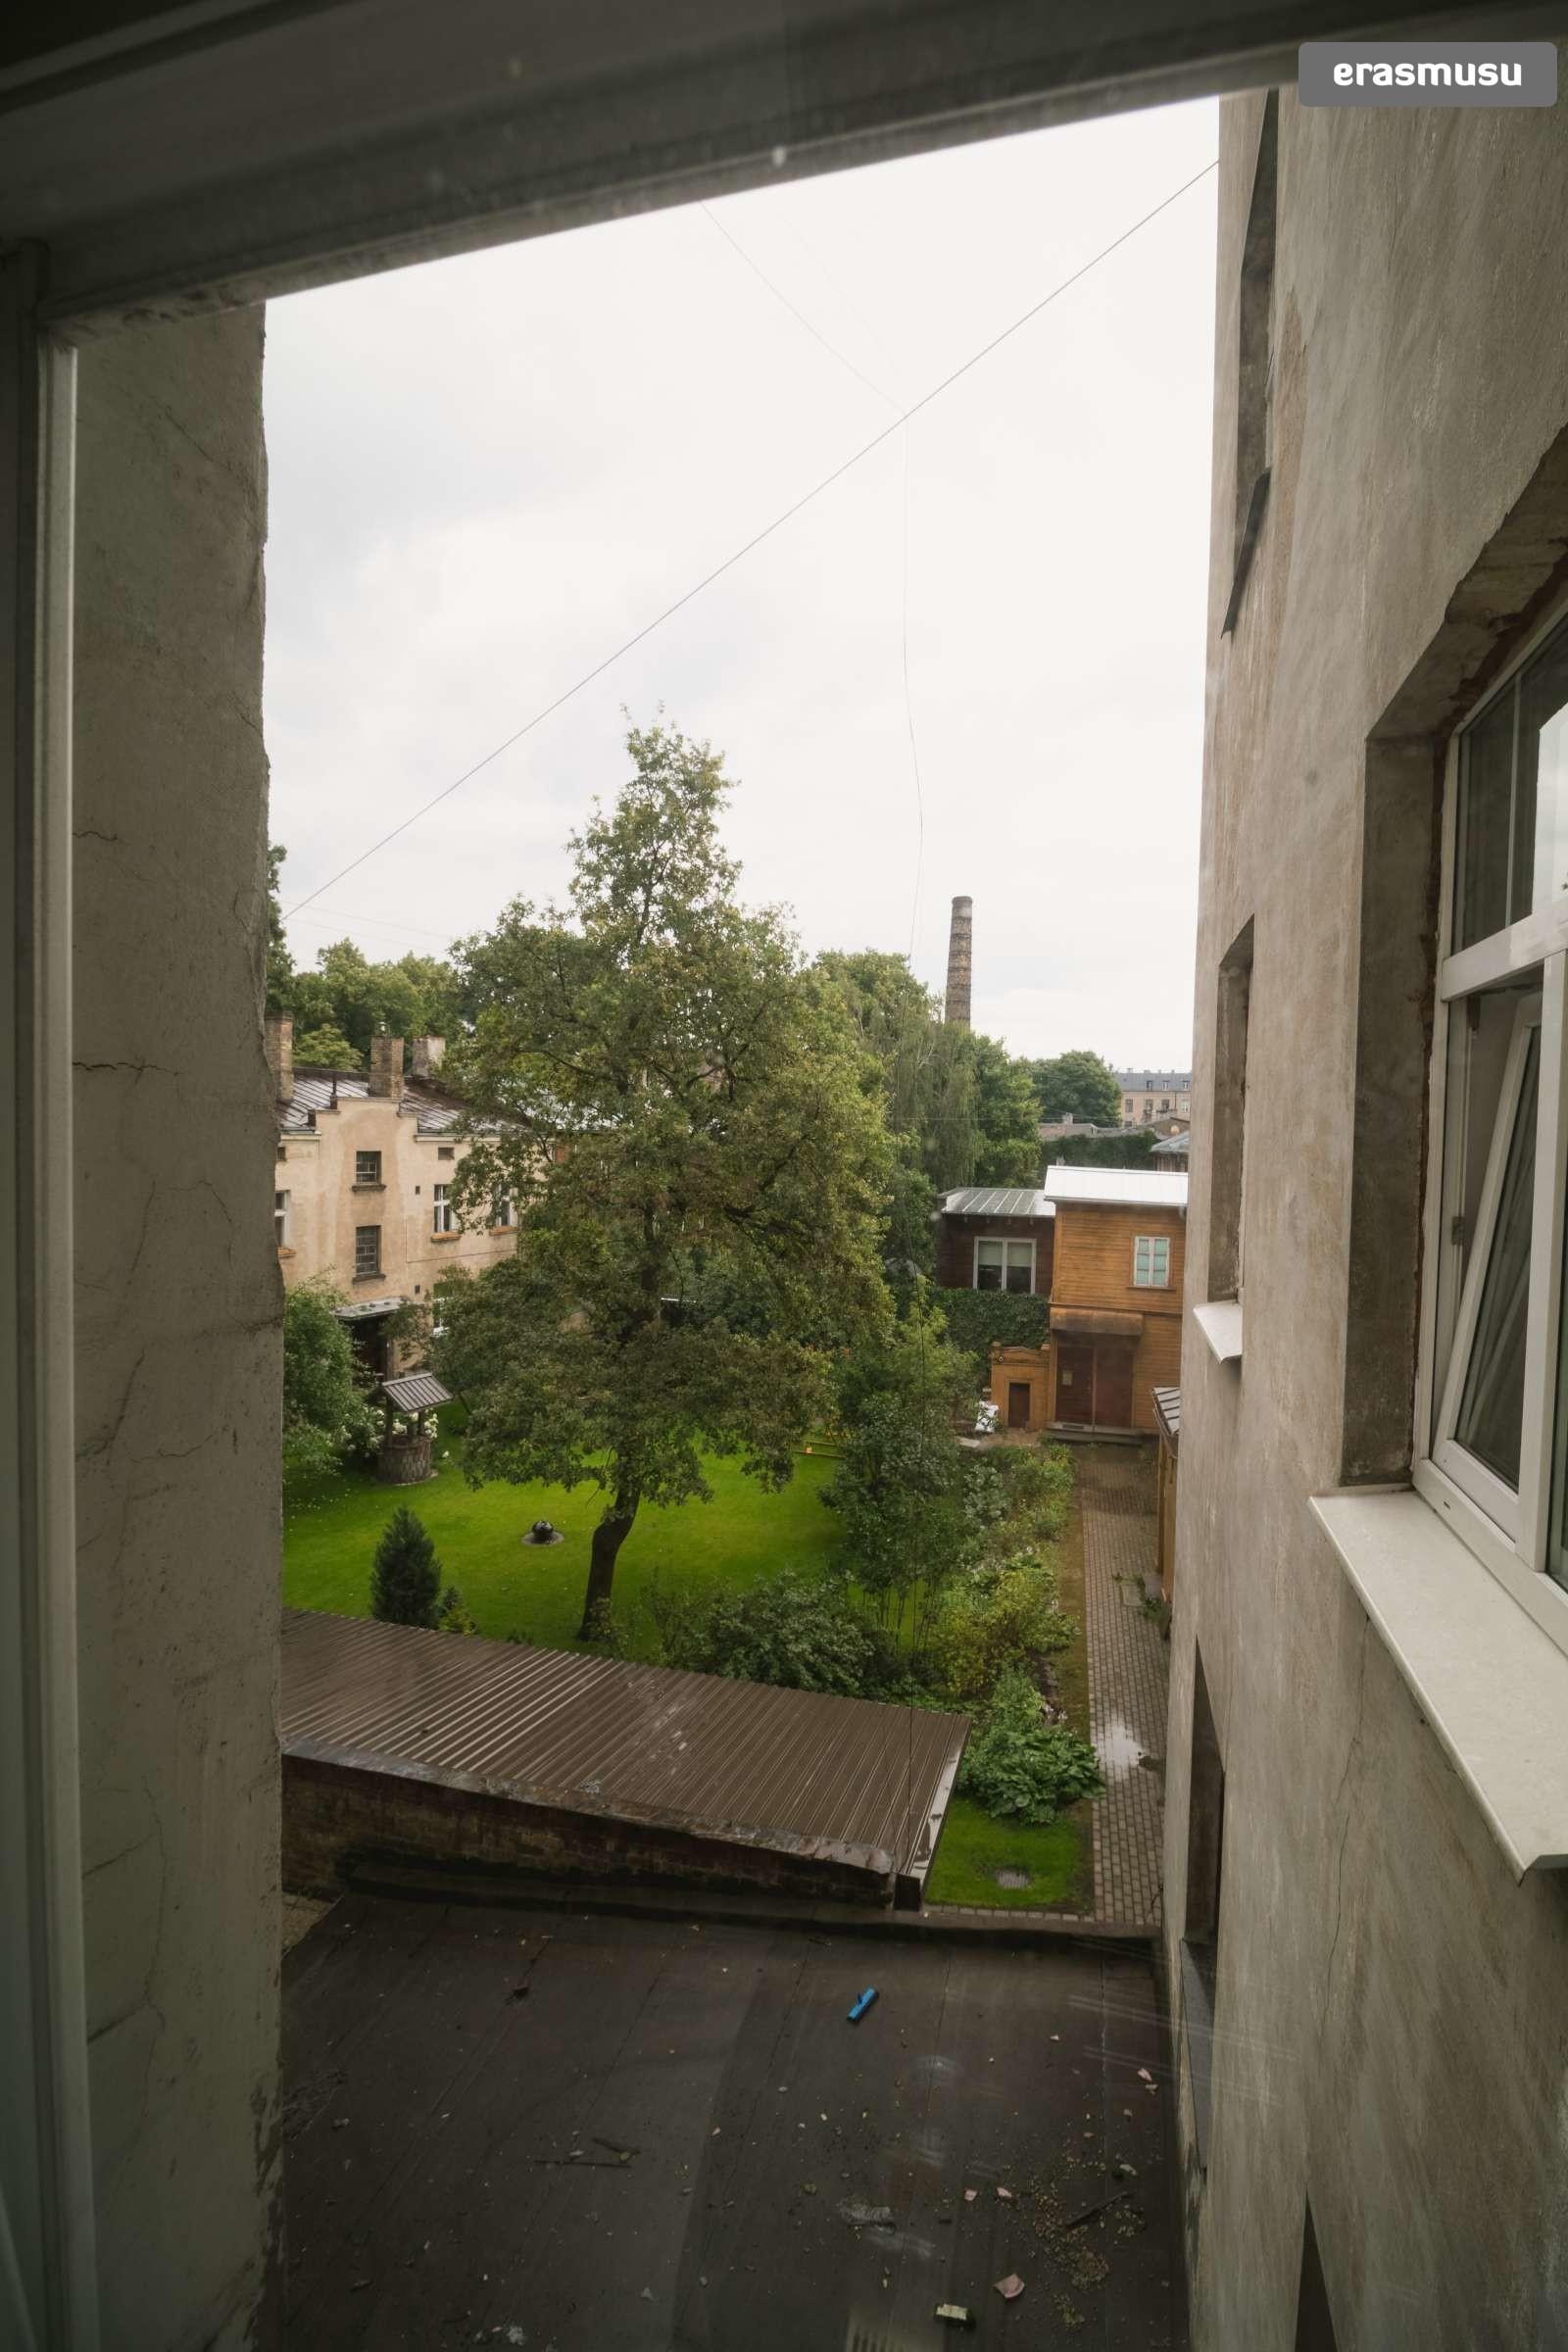 cozy-1-bedroom-apartment-rent-avoti-ad8ce65d31026b9f551a2aef9caf